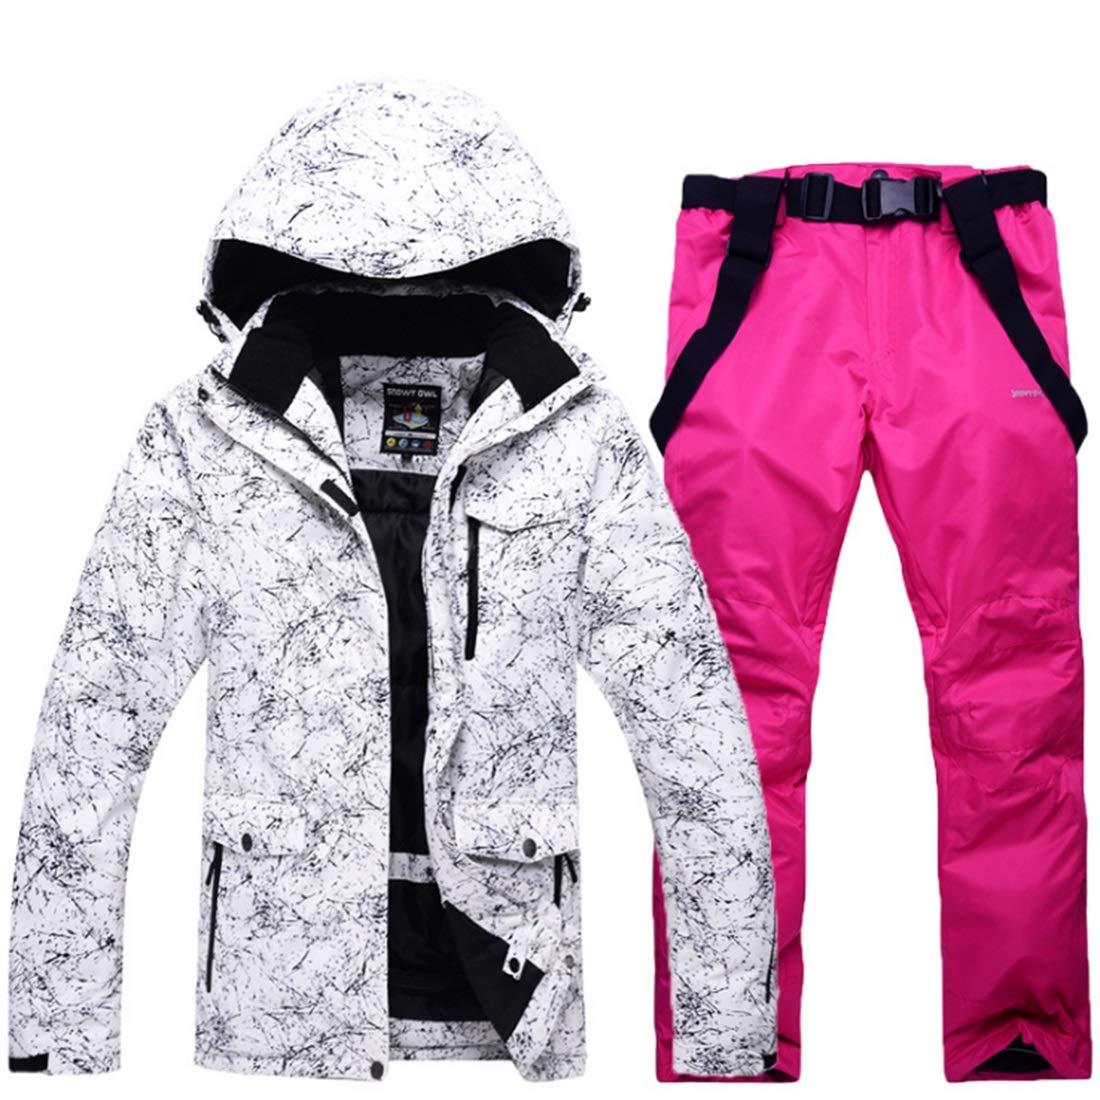 CEFULTY Mens /& Womens Snowsuit Winter Ski Jacket and Pants Set